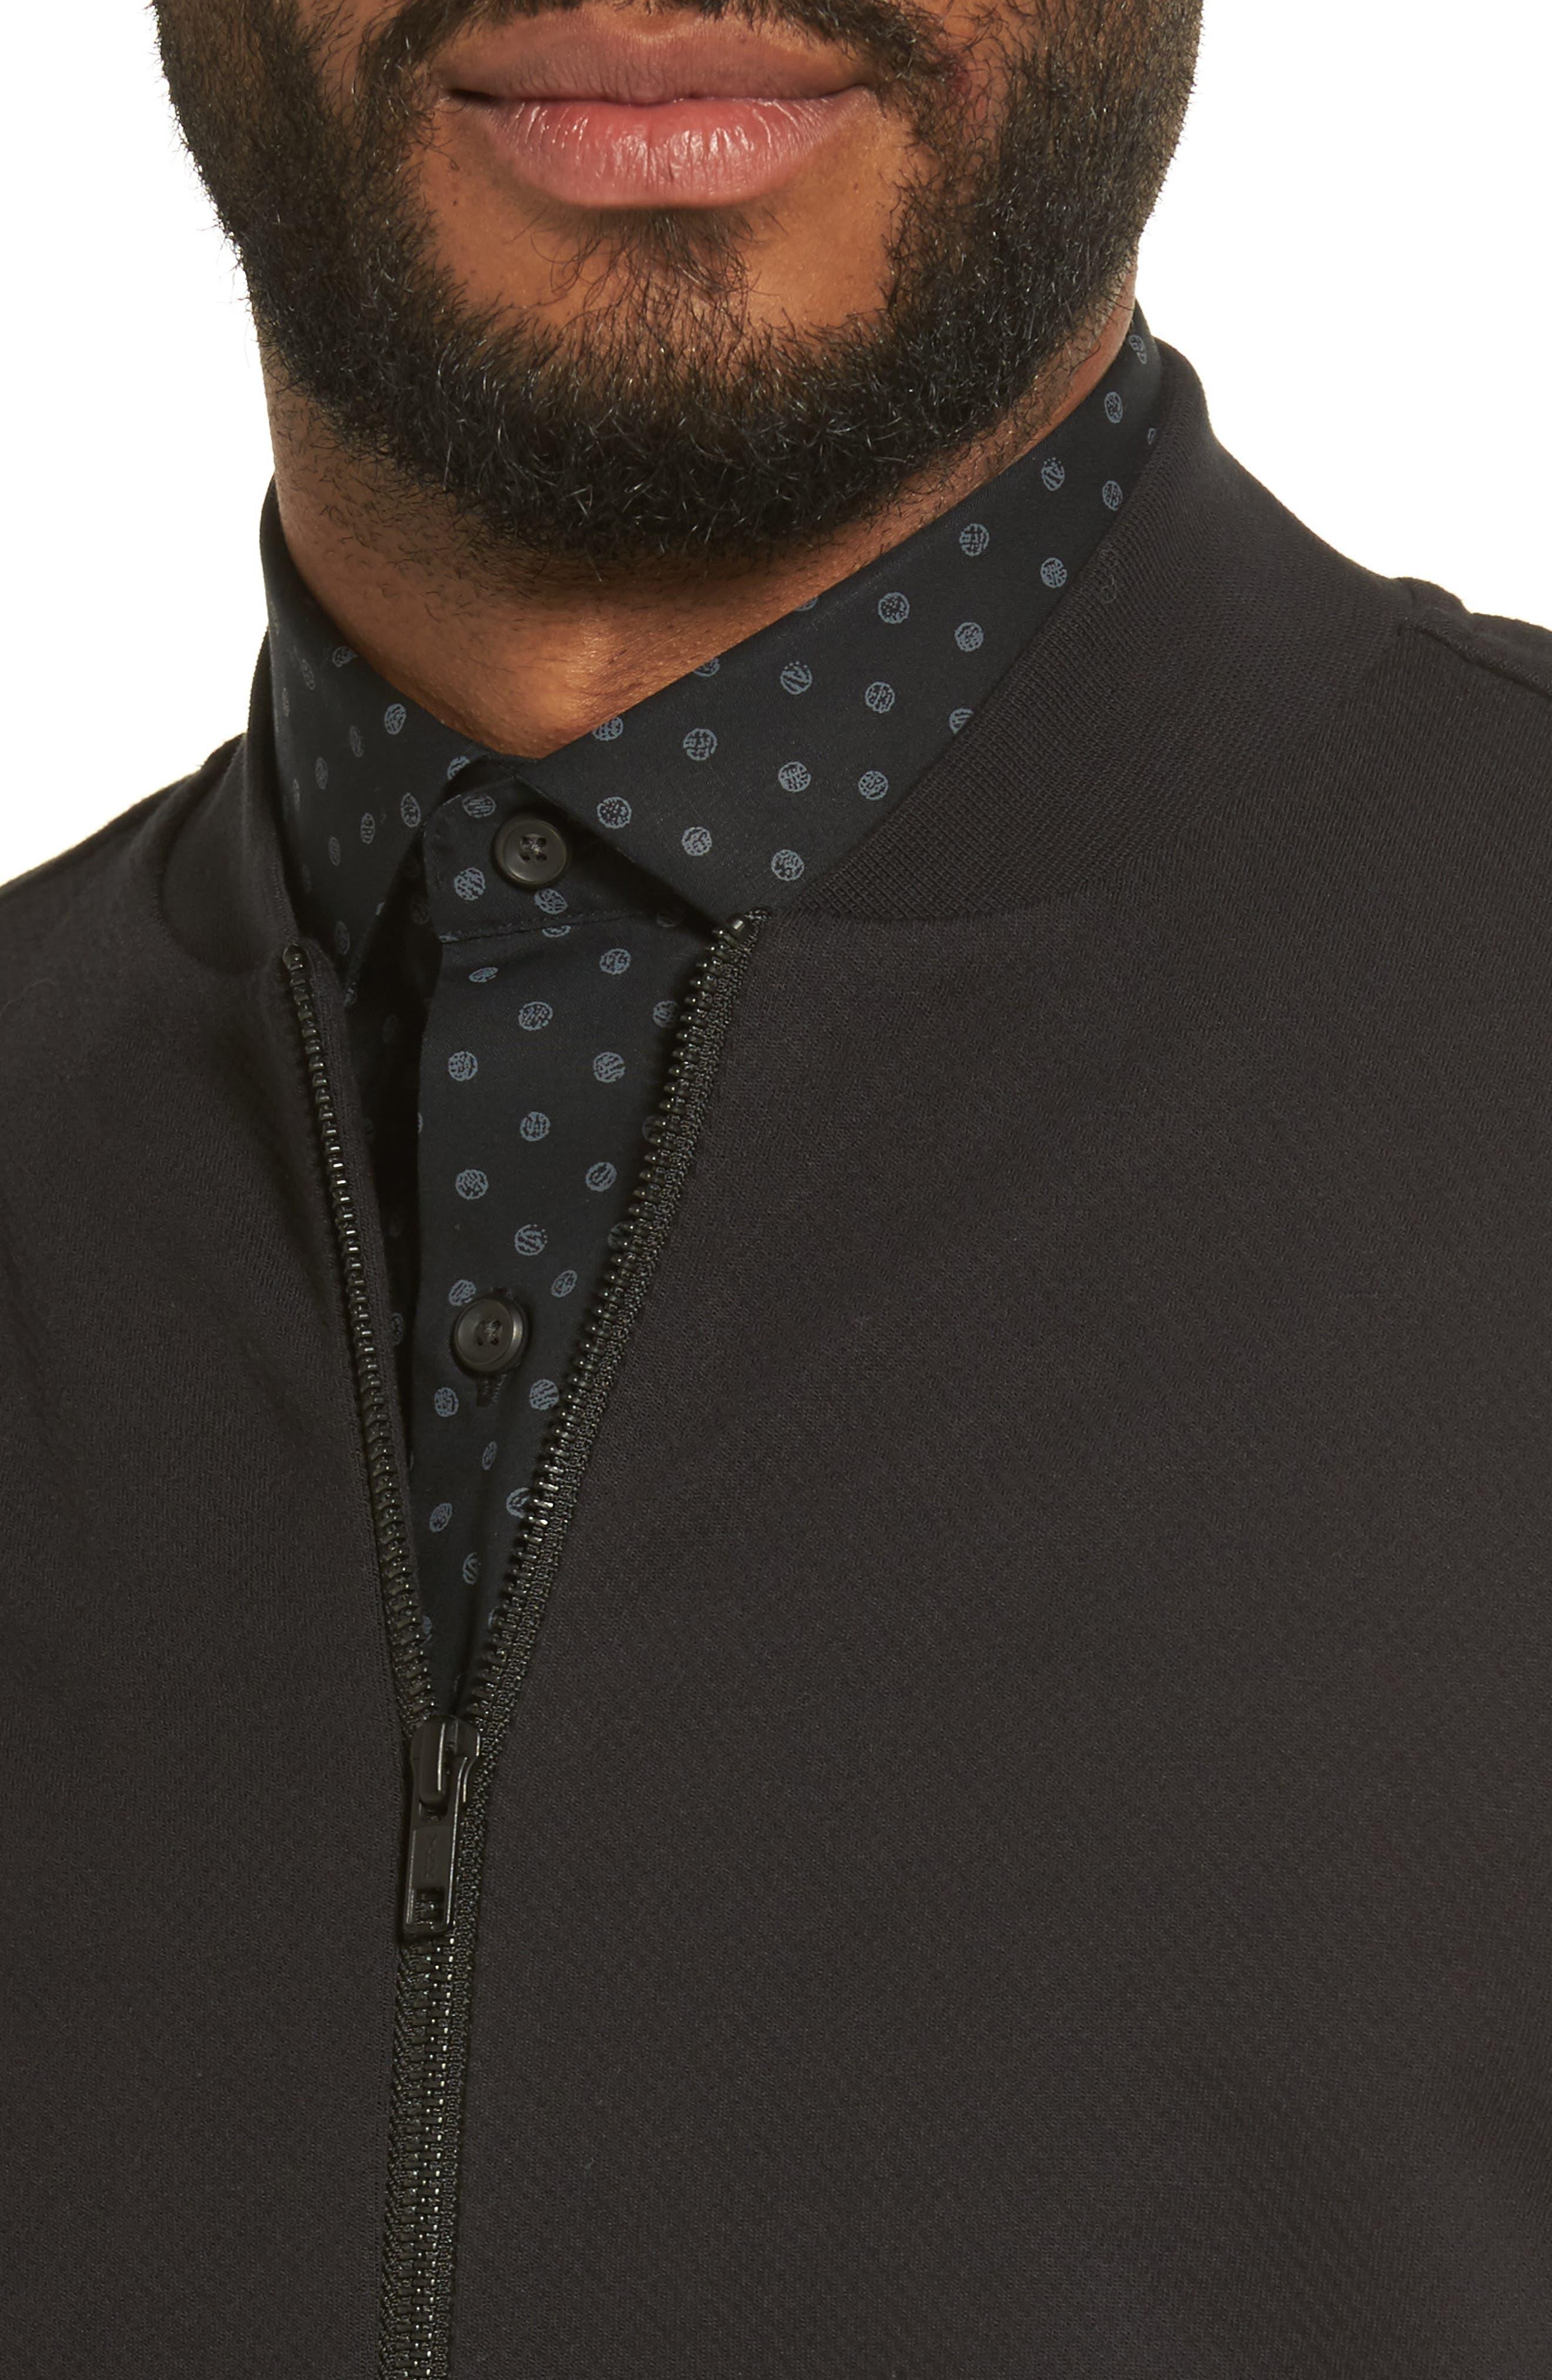 Zip Fleece Bomber Jacket,                             Alternate thumbnail 4, color,                             Black Caviar